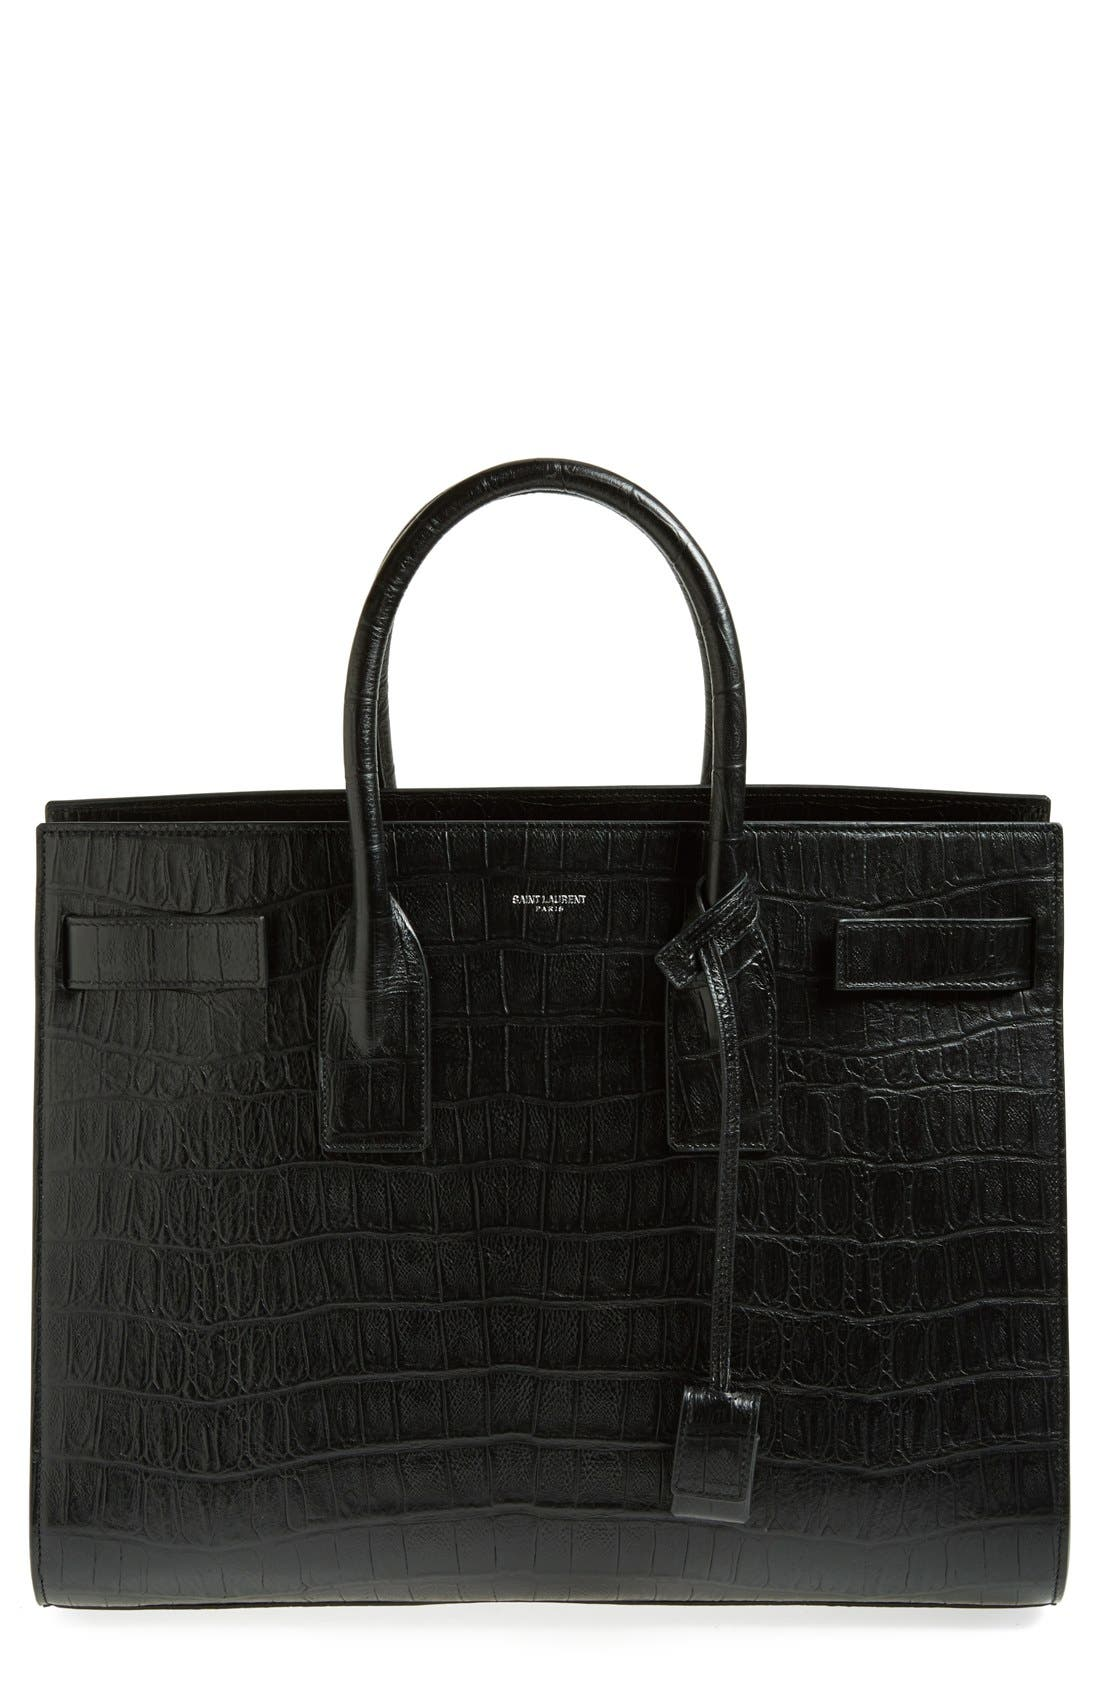 Alternate Image 1 Selected - Saint Laurent 'Sac de Jour' Croc Embossed Leather Tote